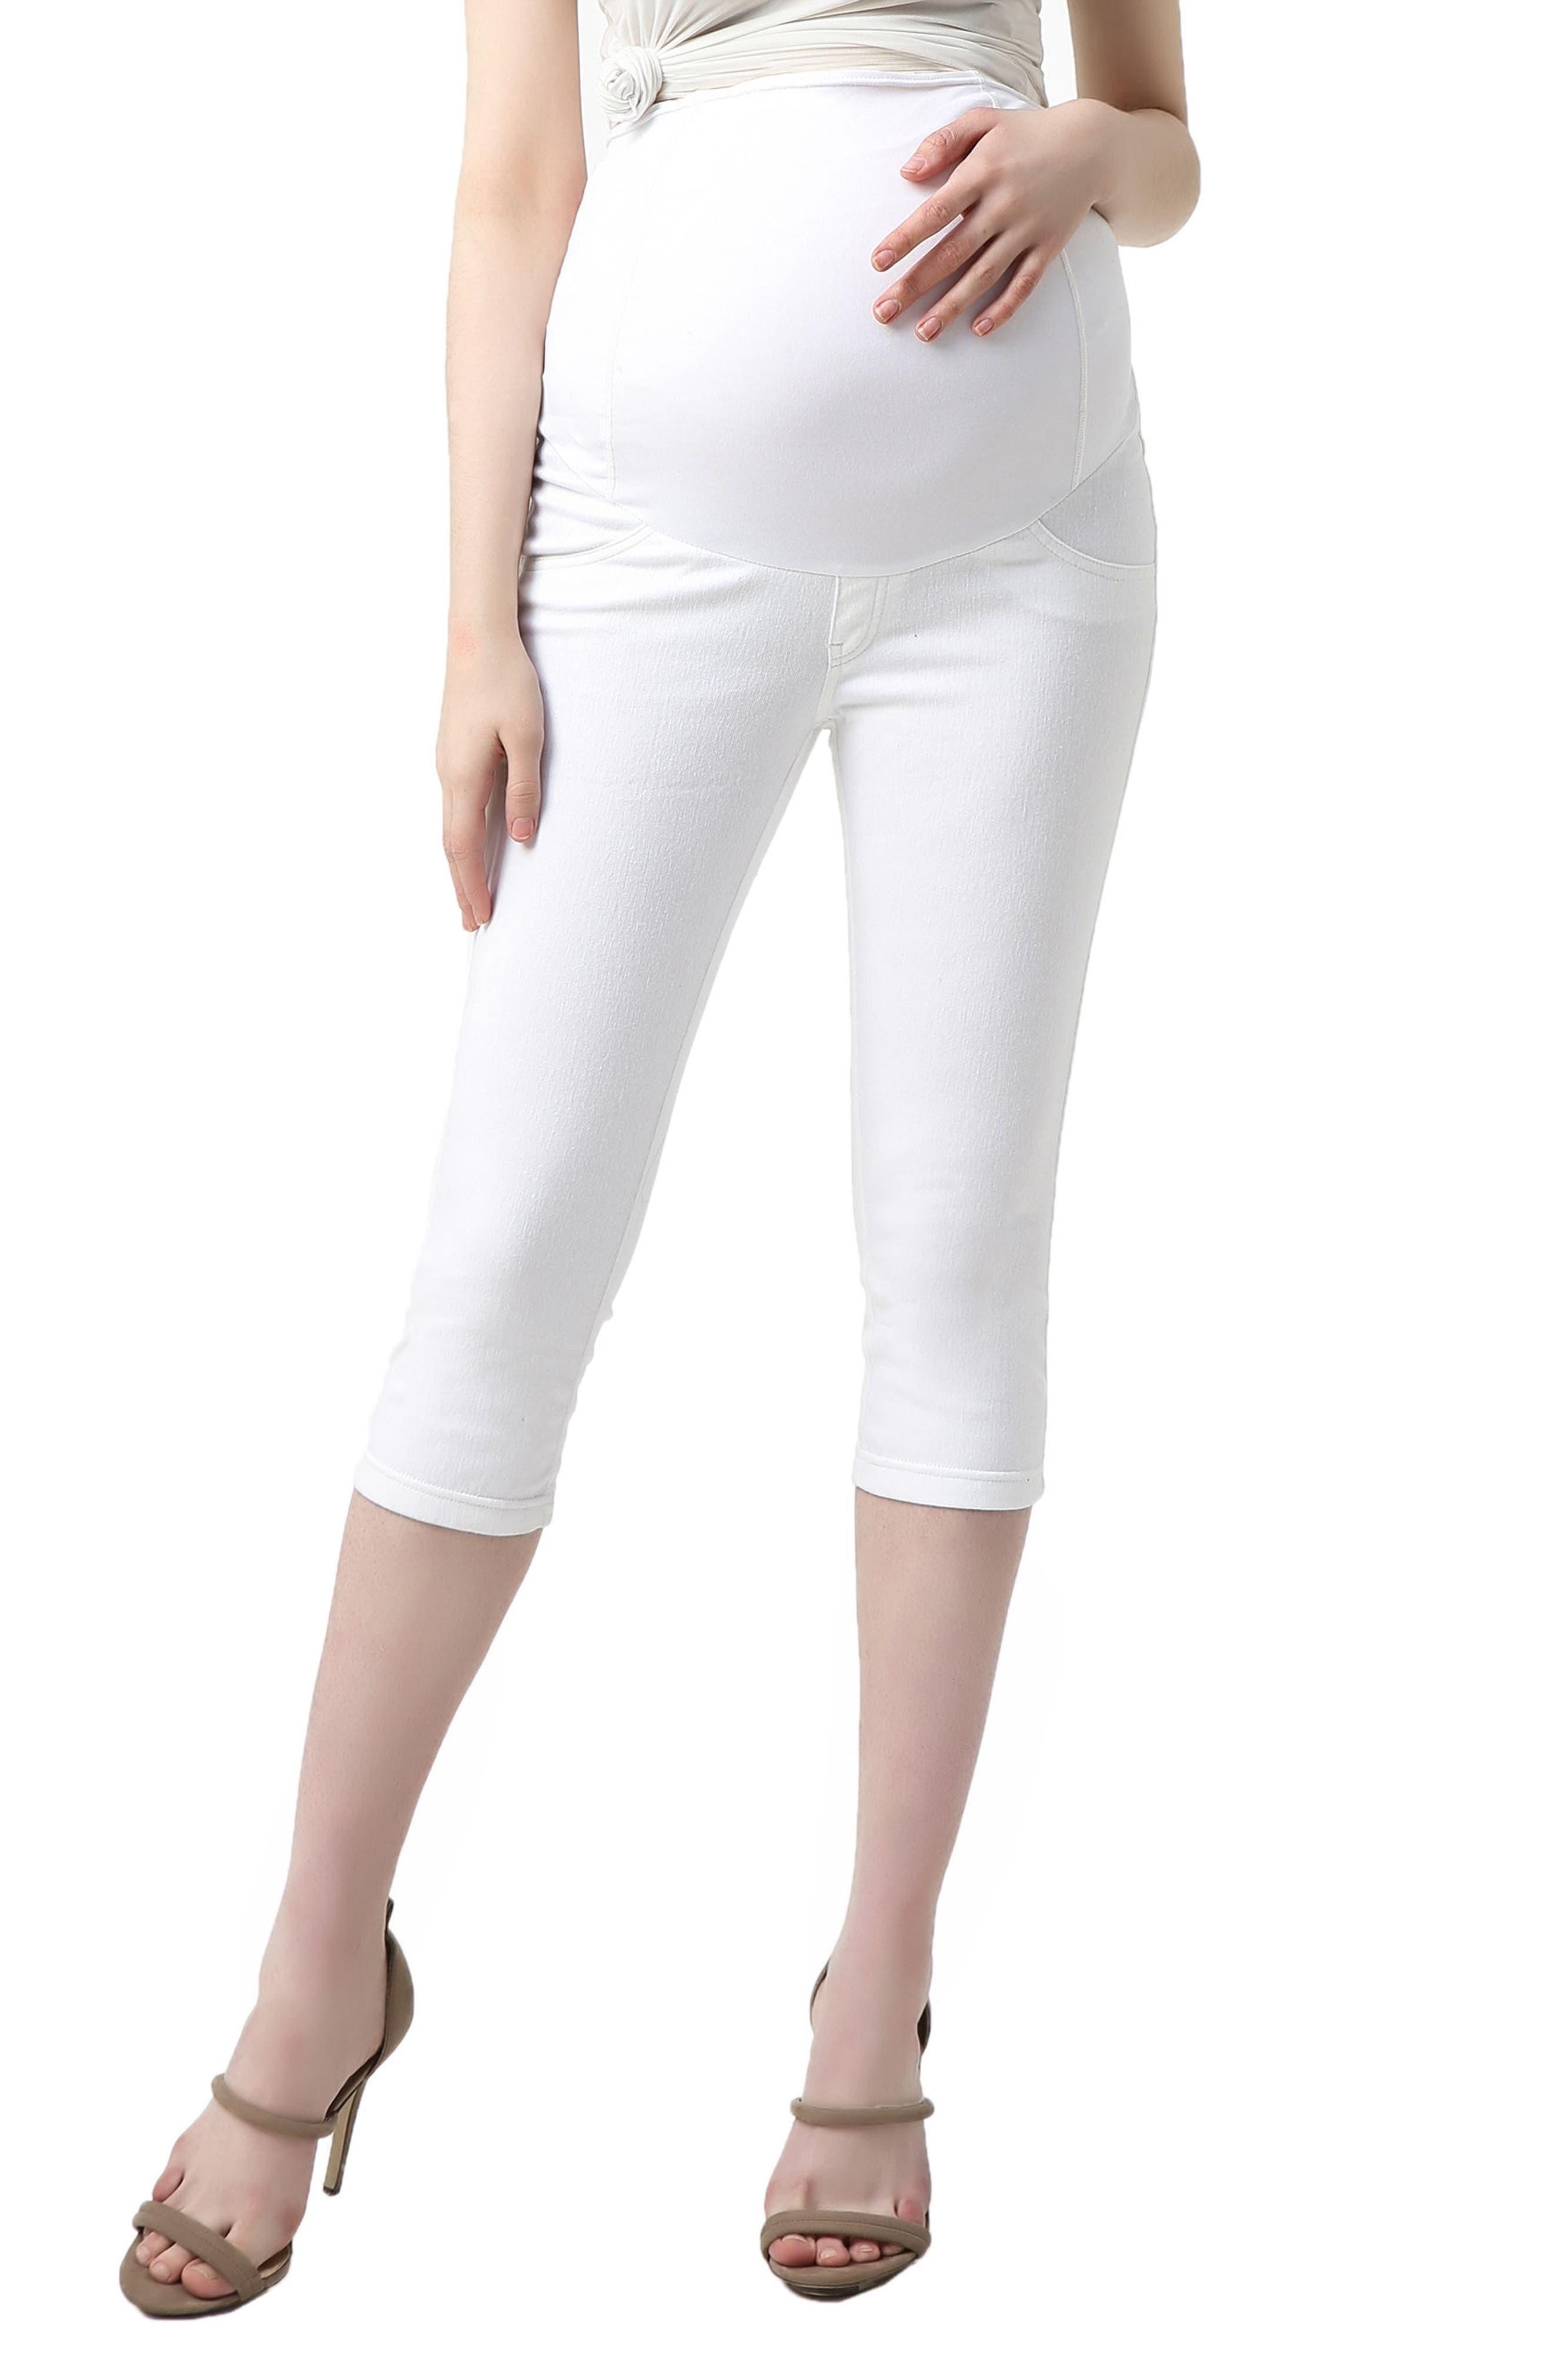 Melody Capri Denim Maternity Leggings,                         Main,                         color, WHITE